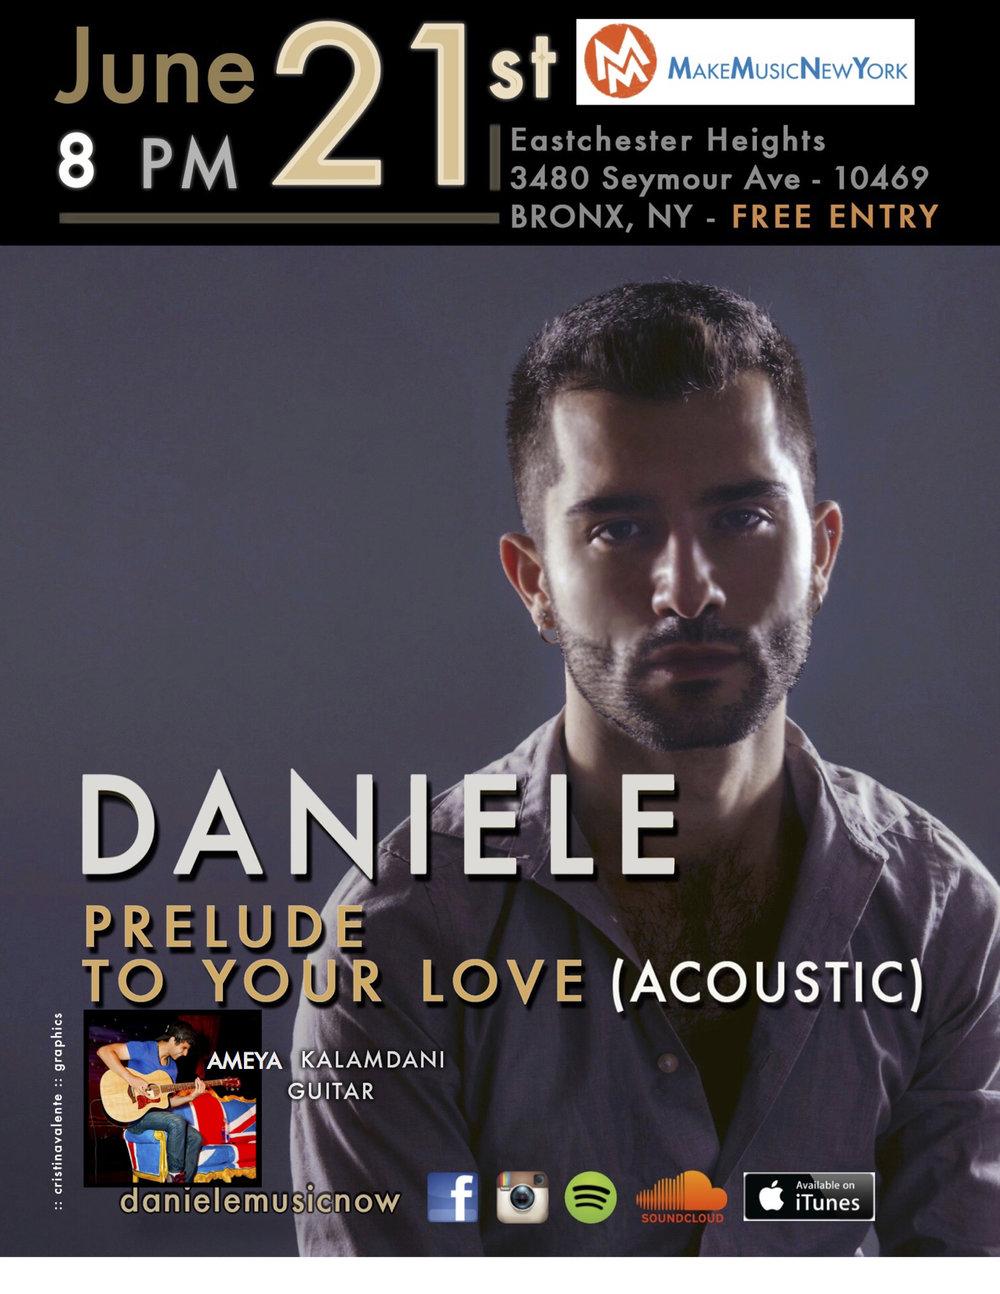 DANIELE MAKE MUSIC NEW YORK.jpg